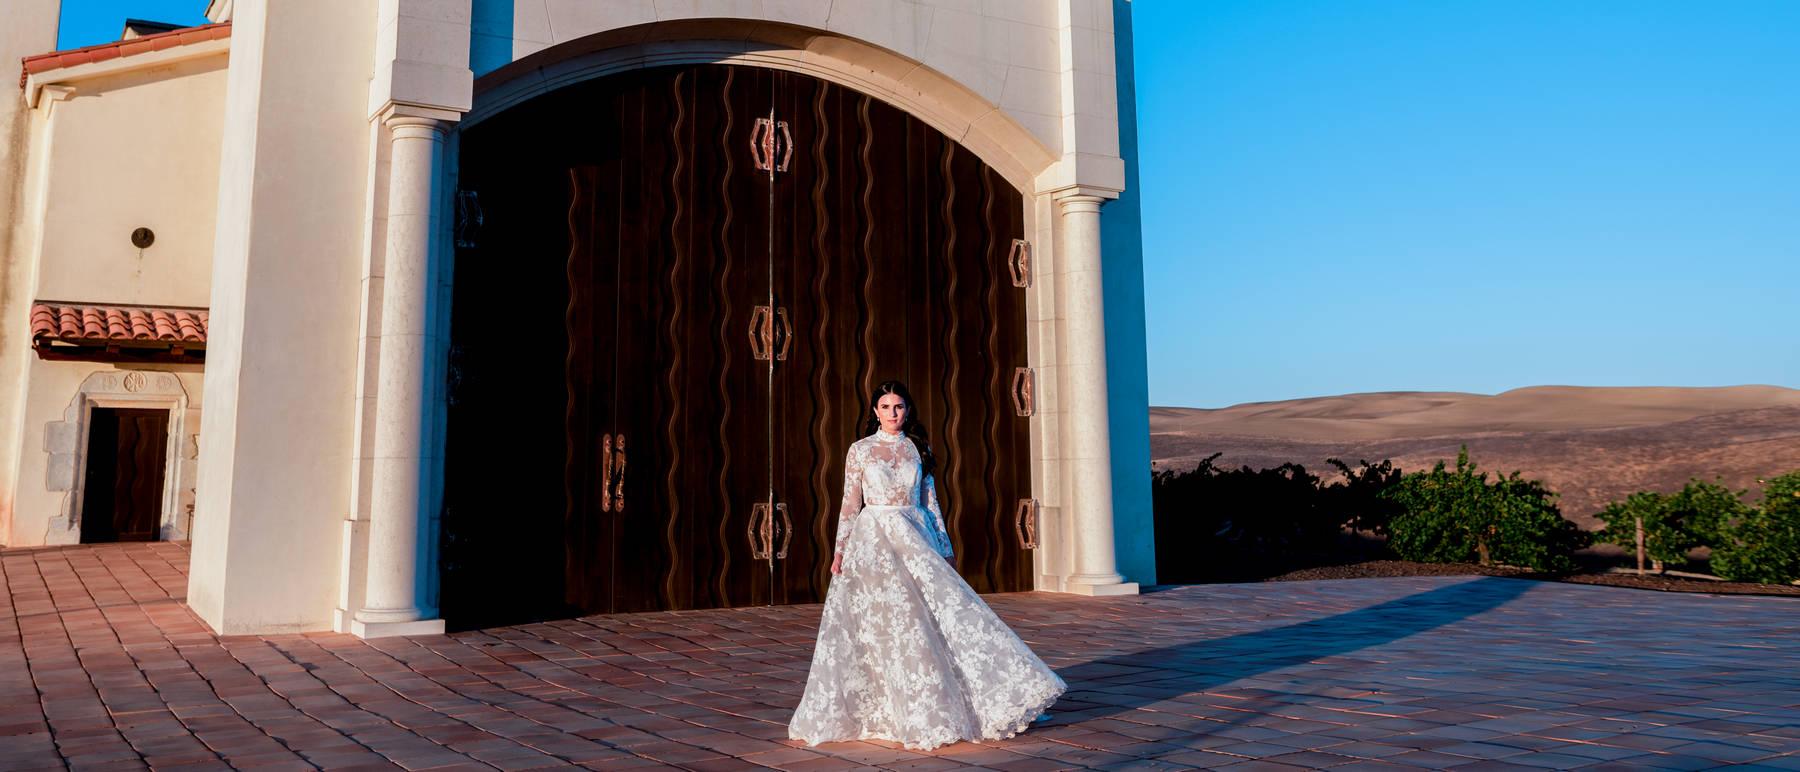 johnandjoseph-wedding-photographer-hz-slider-105